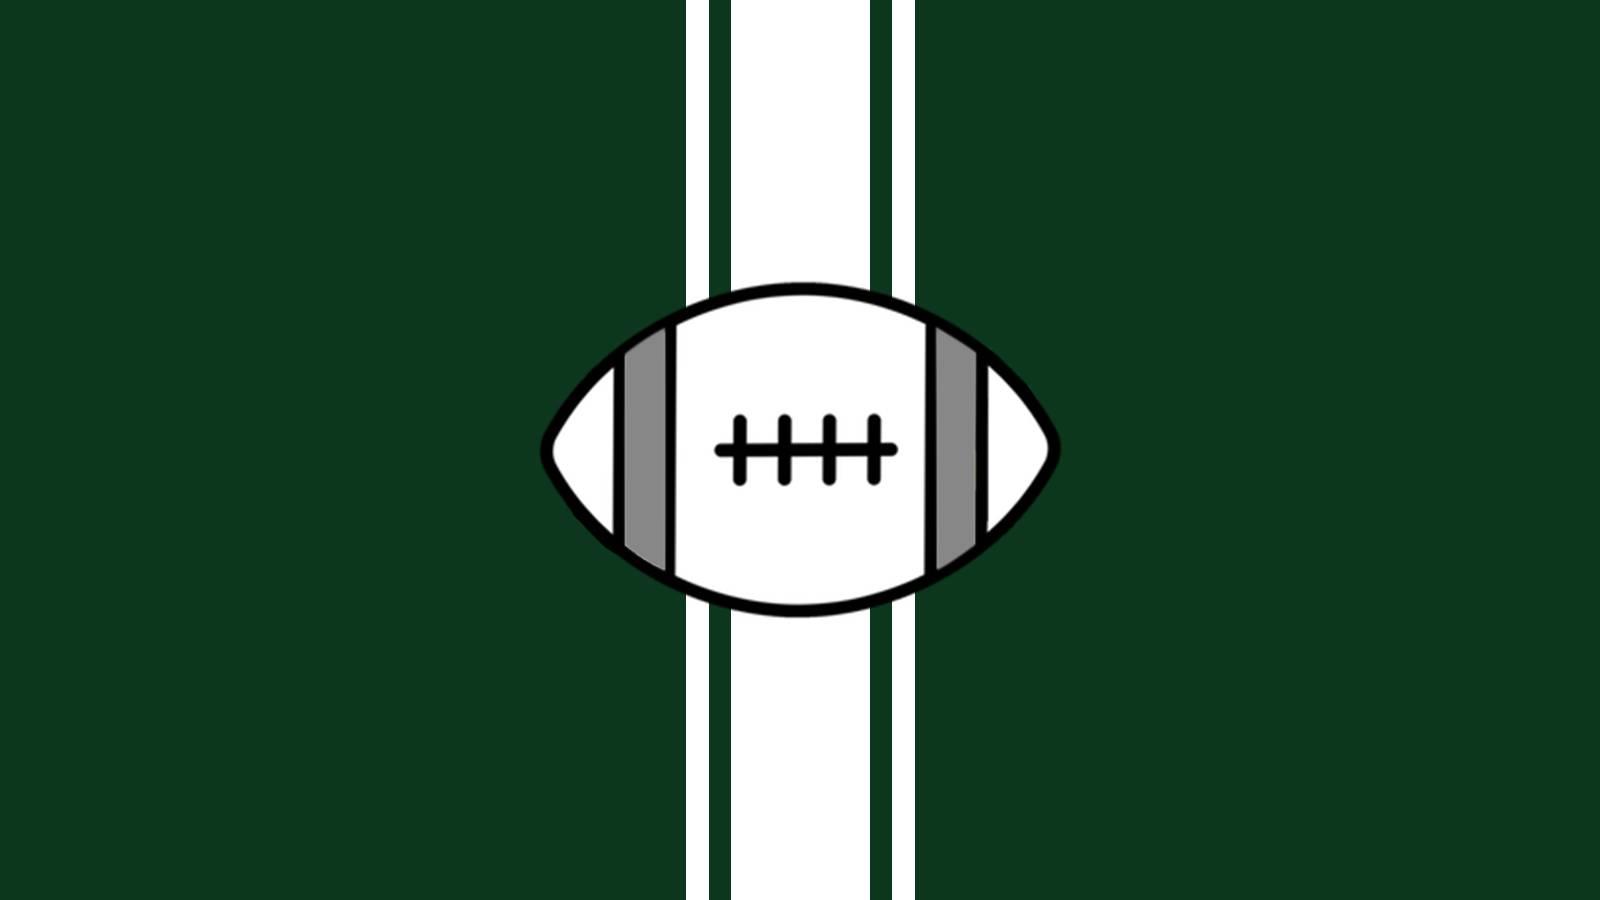 NFL Preseason - New York Giants at New York Jets